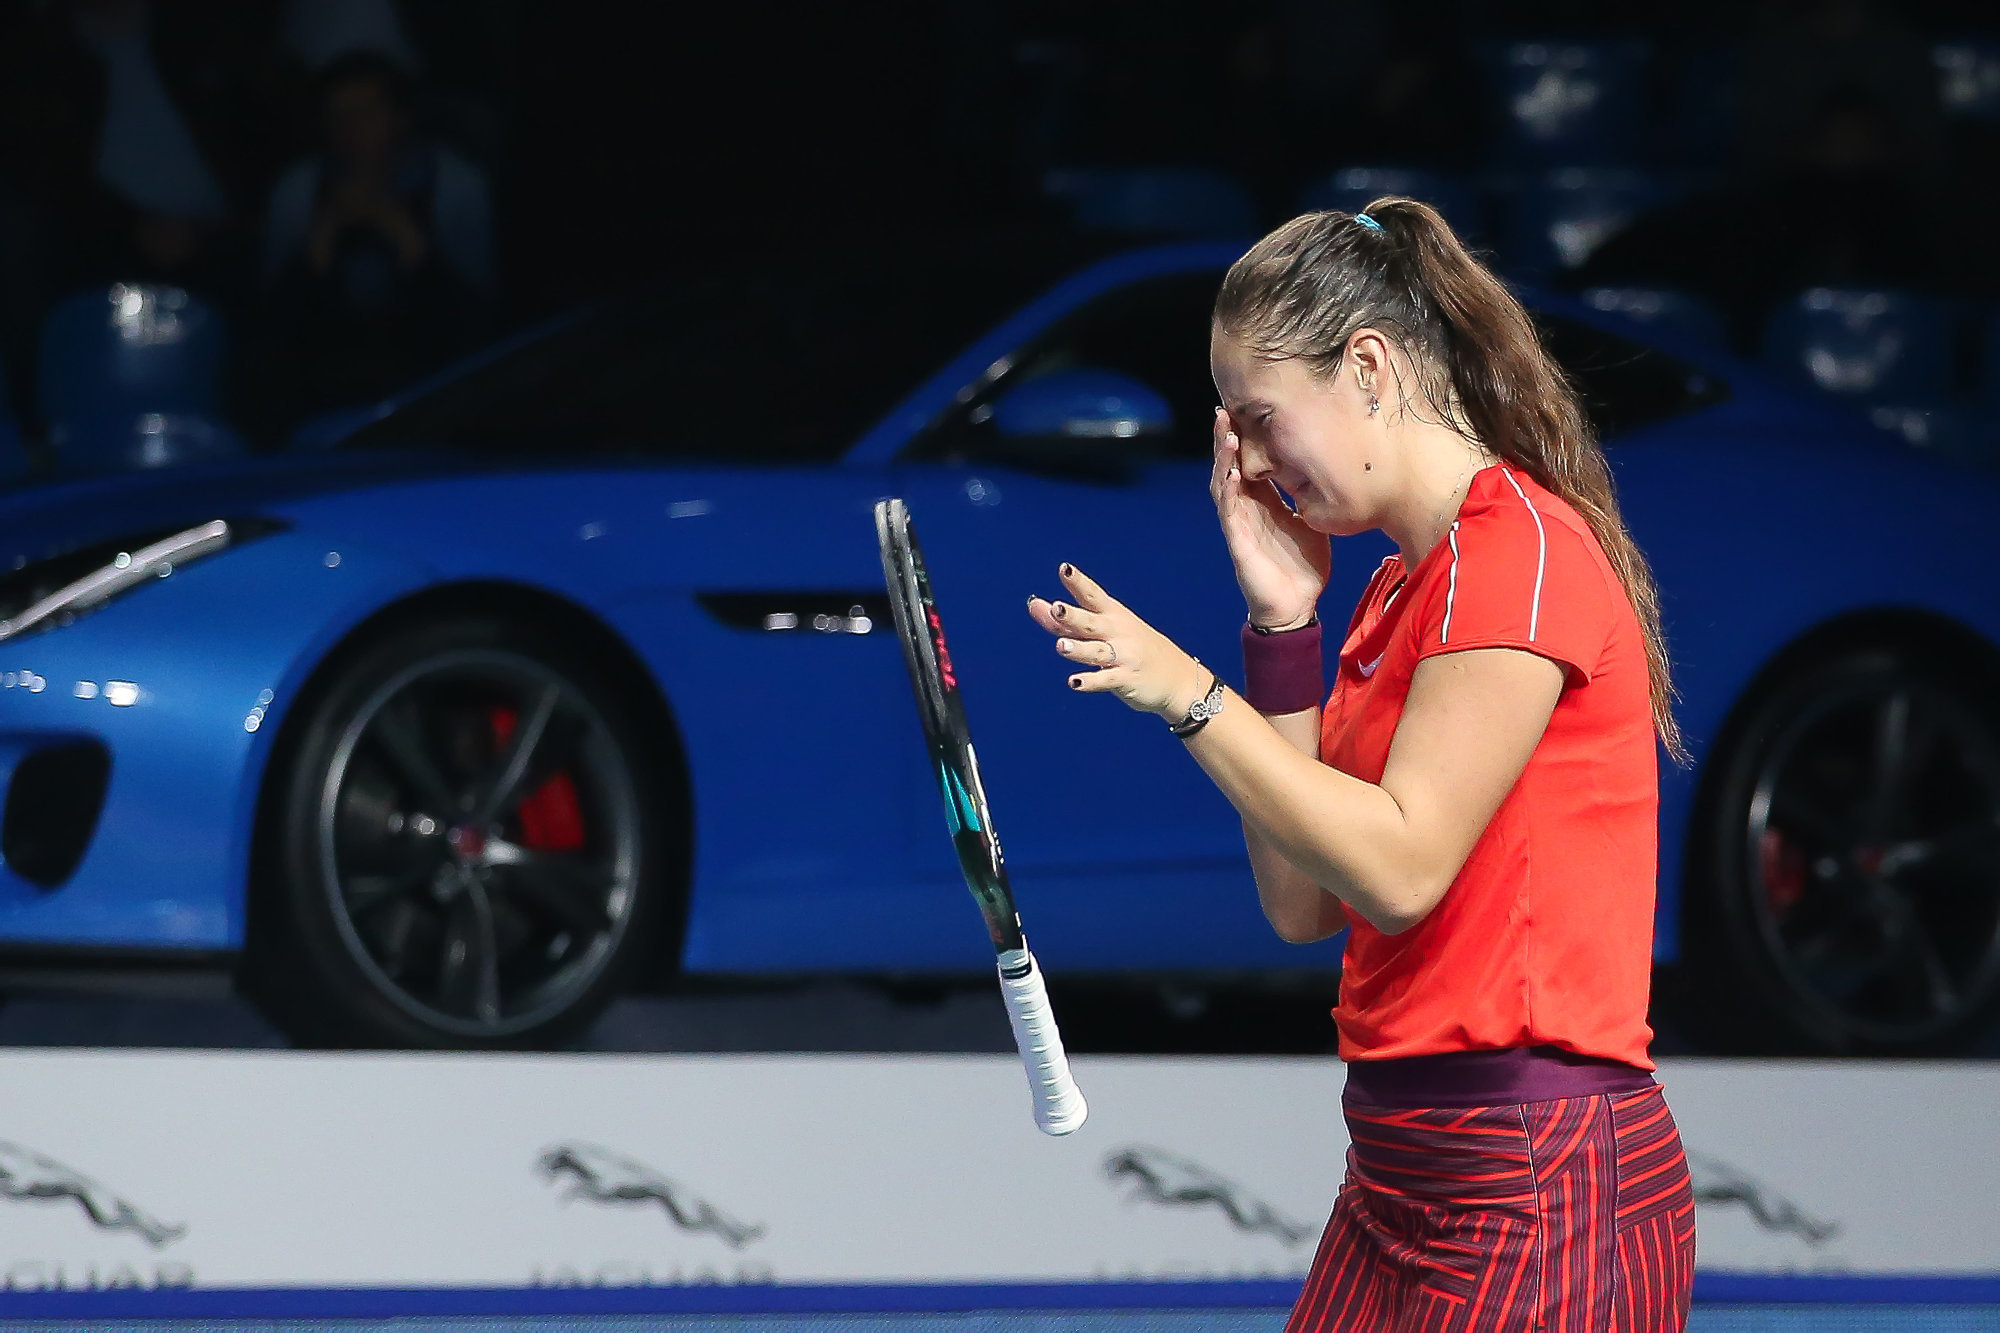 Дарья Касаткина: «Я плакала вместе с Надалем, когда он выиграл 13-й титул на «Ролан Гаррос»